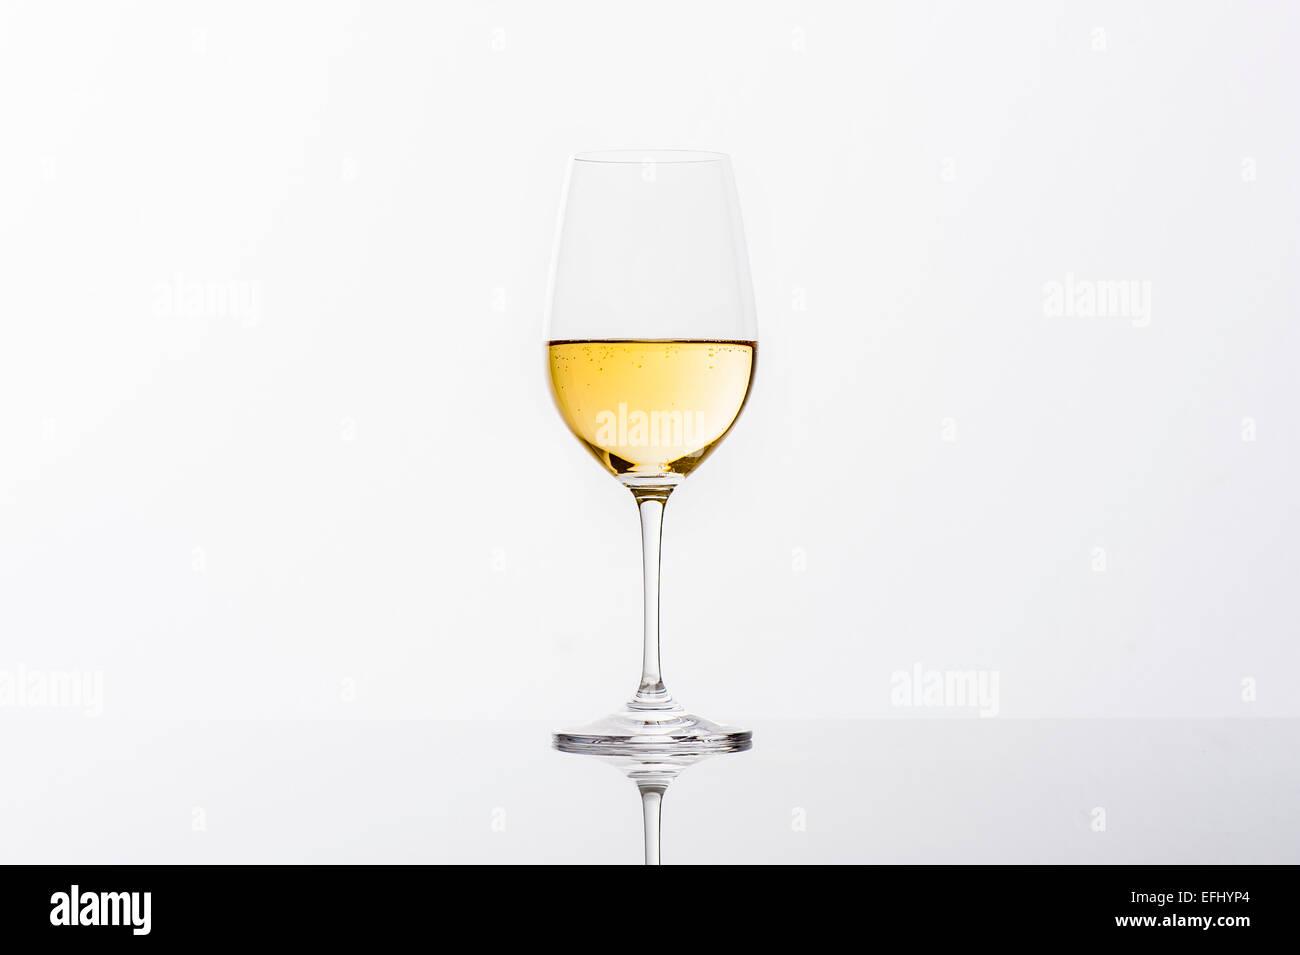 Glass of white wine, Hamburg, Northern Germany, Germany - Stock Image